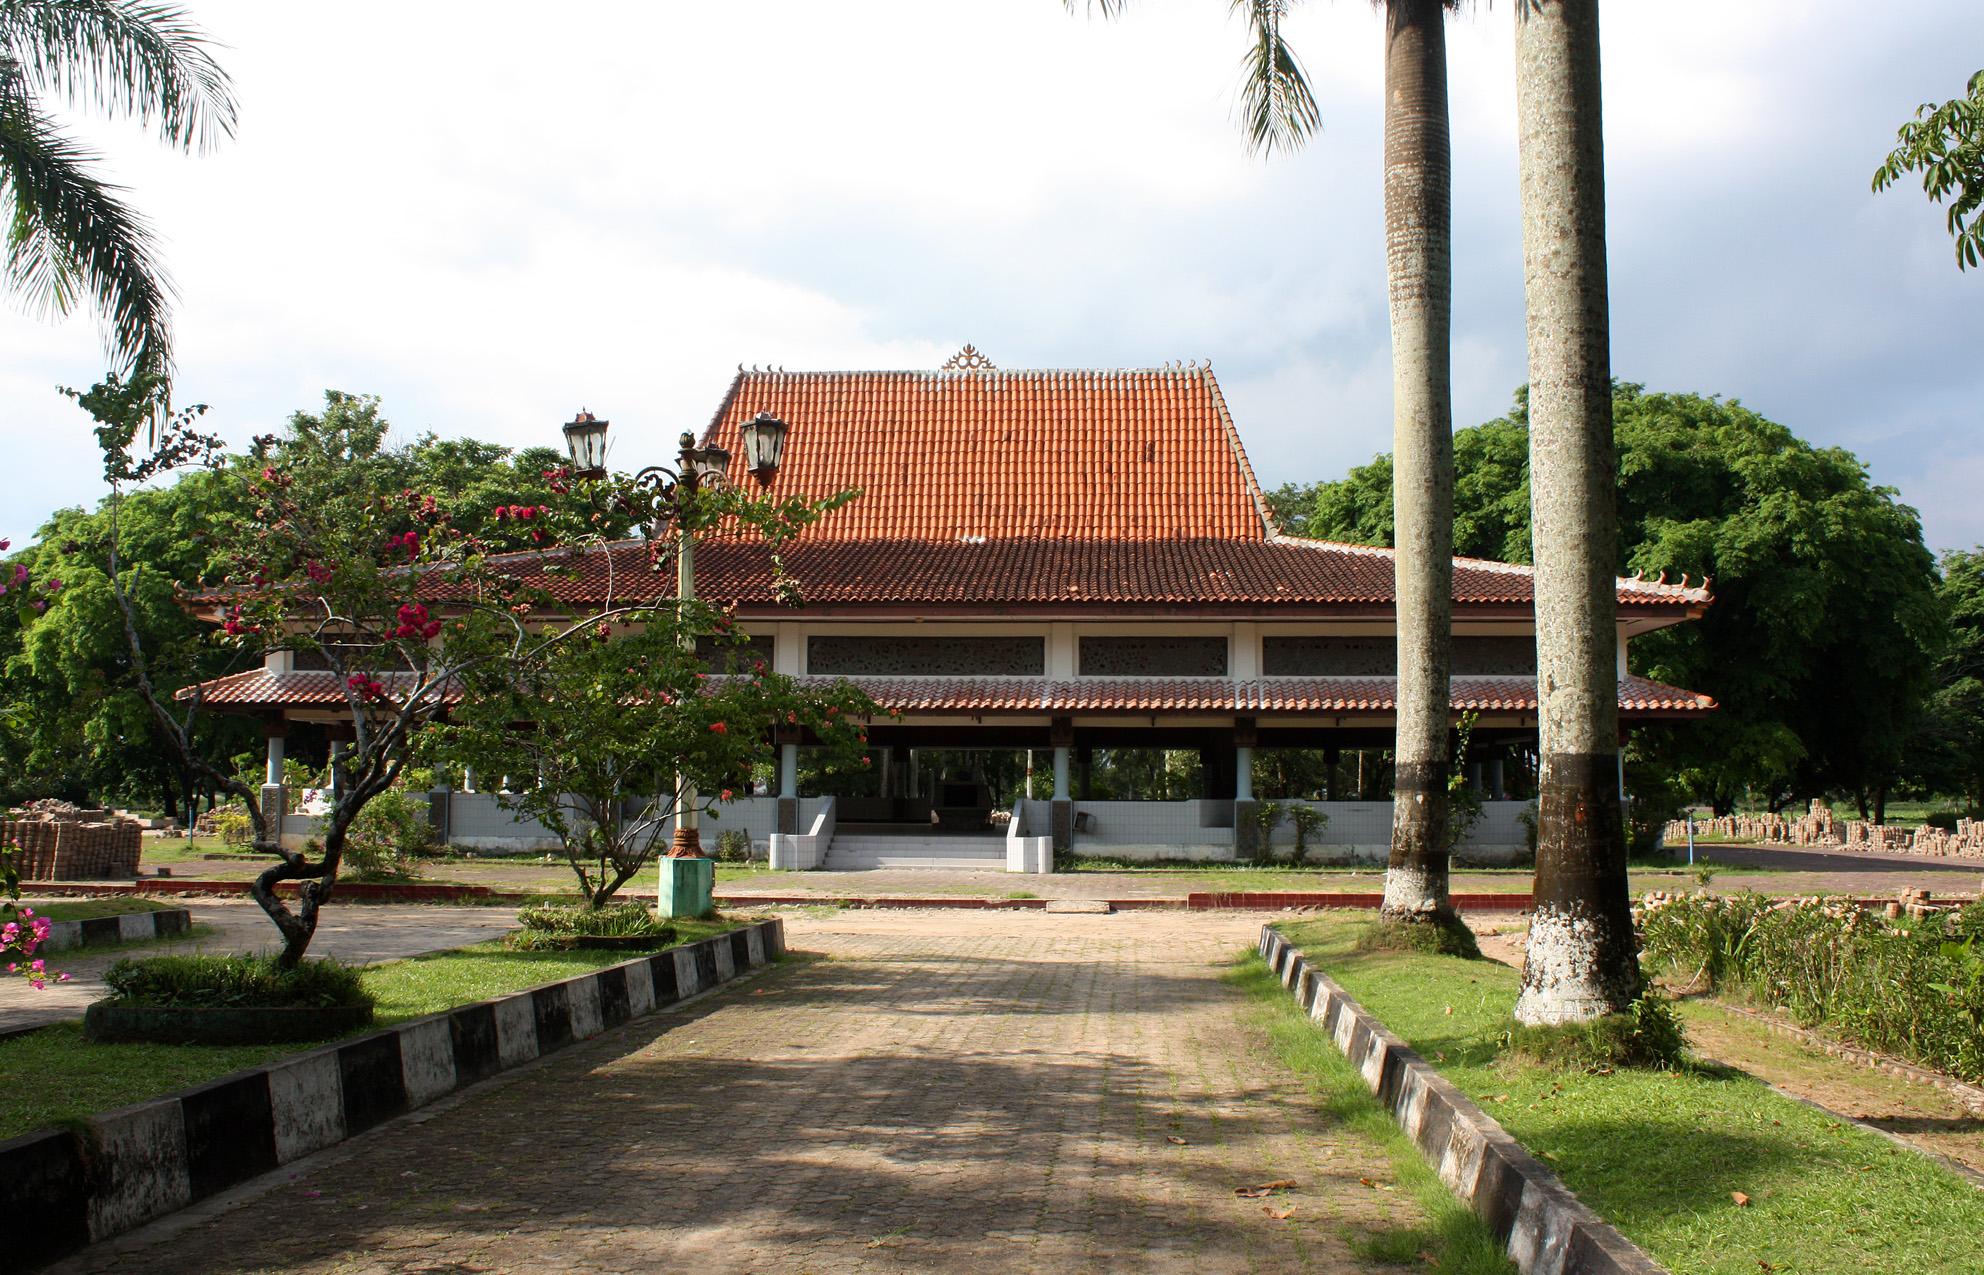 Sriwijaya Kingdom Archaeological Park Wikipedia Taman Purbakala Kerajaan Kota Palembang